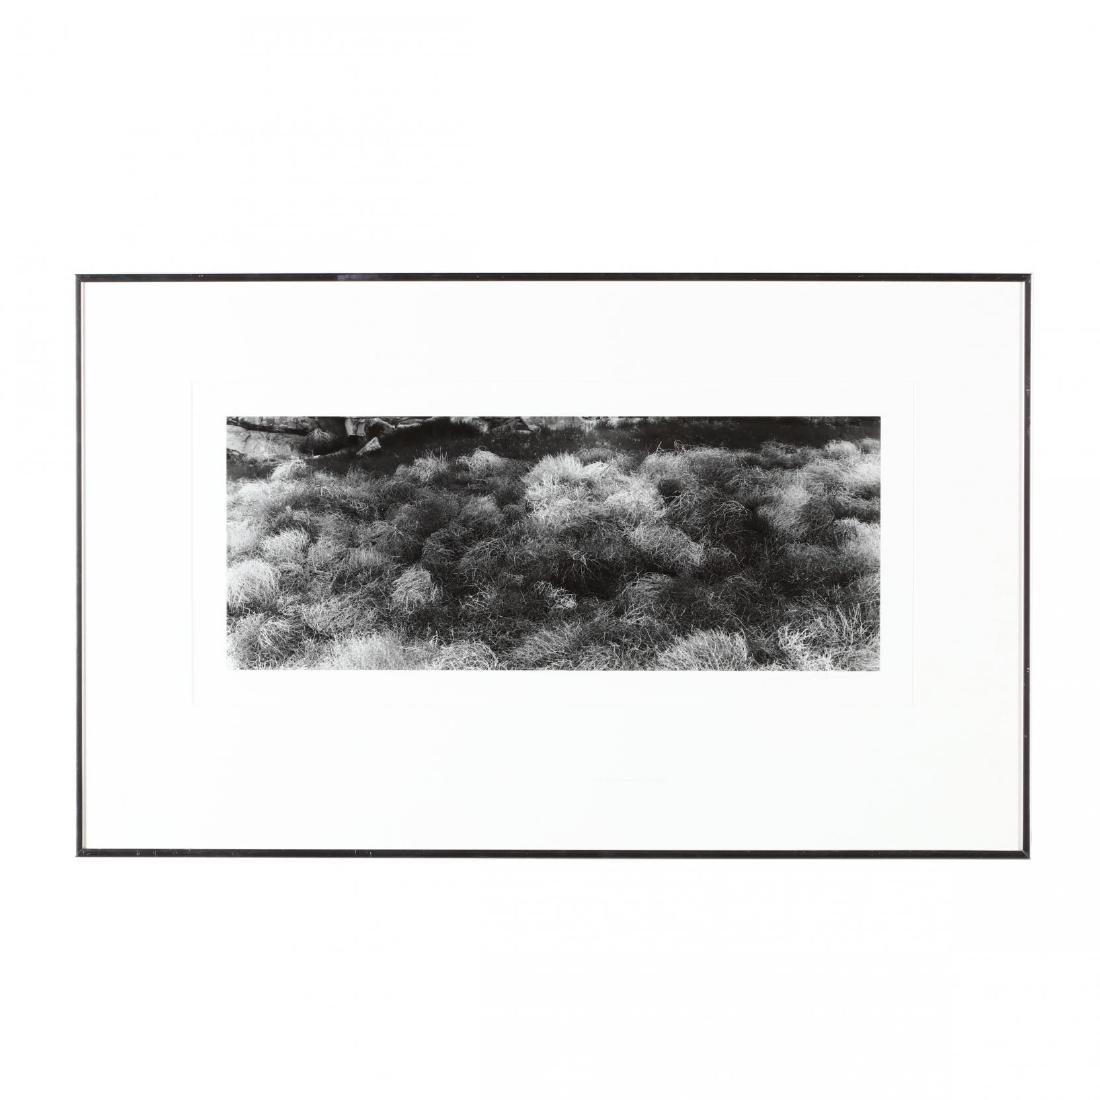 Gary Adams (CA/NV, 20th/21st Century), Sheep Mountain